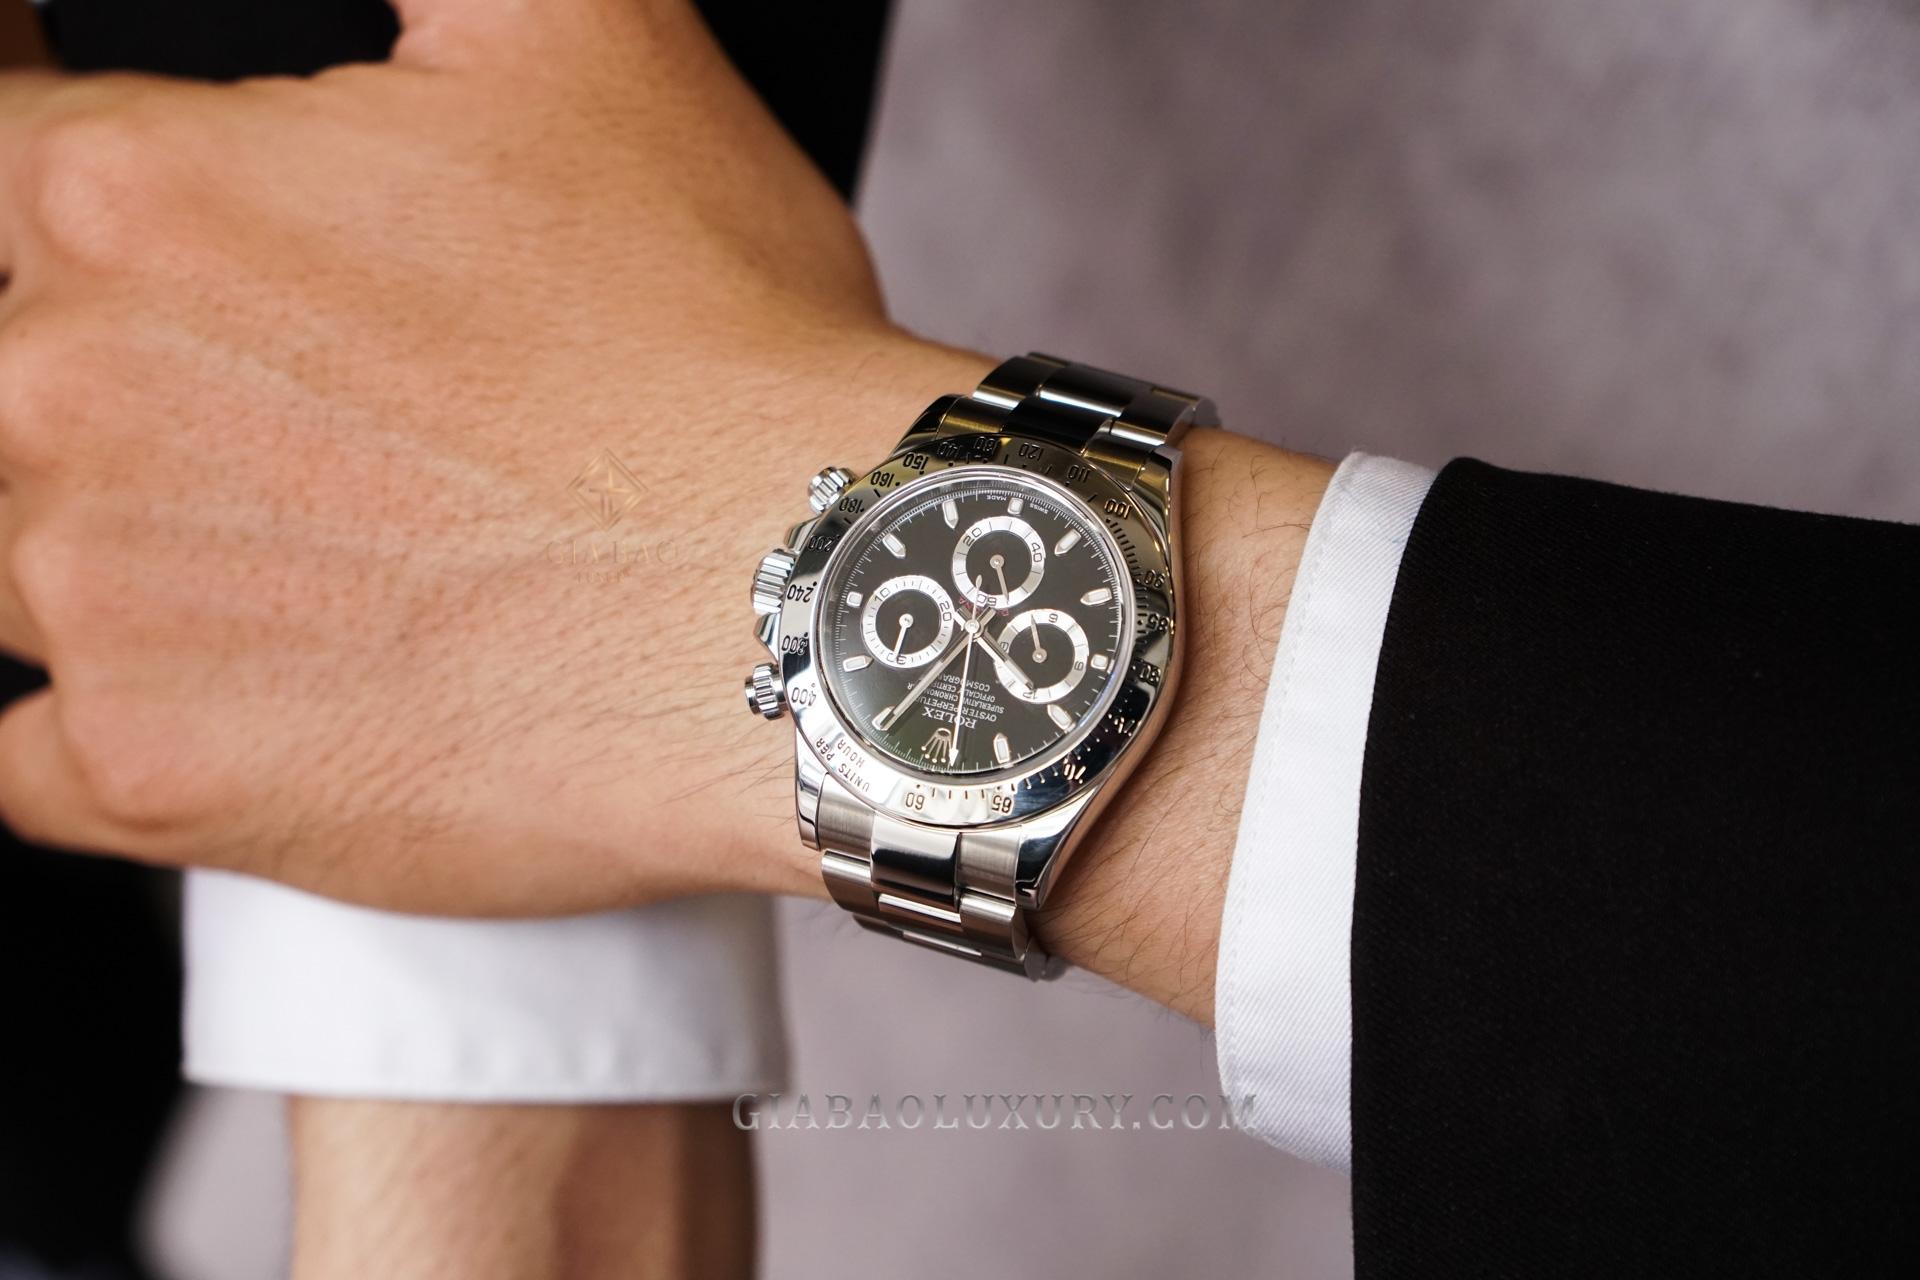 Đồng hồ Rolex Daytona 116520